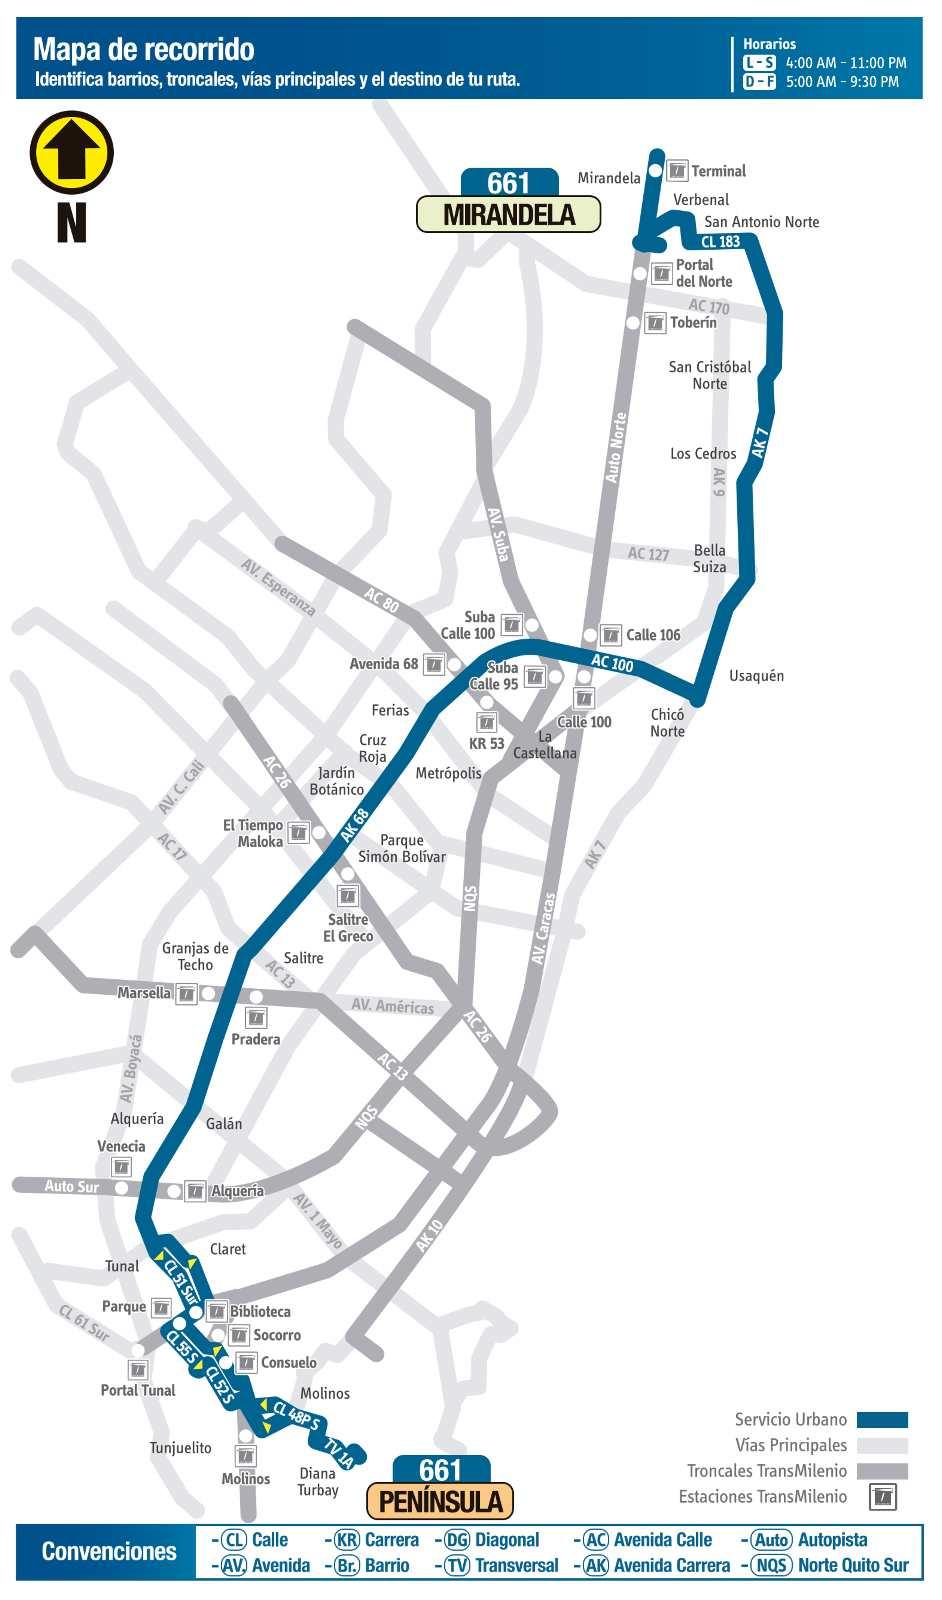 Ruta SITP: 661 Mirandela ↔ Península (mapa)